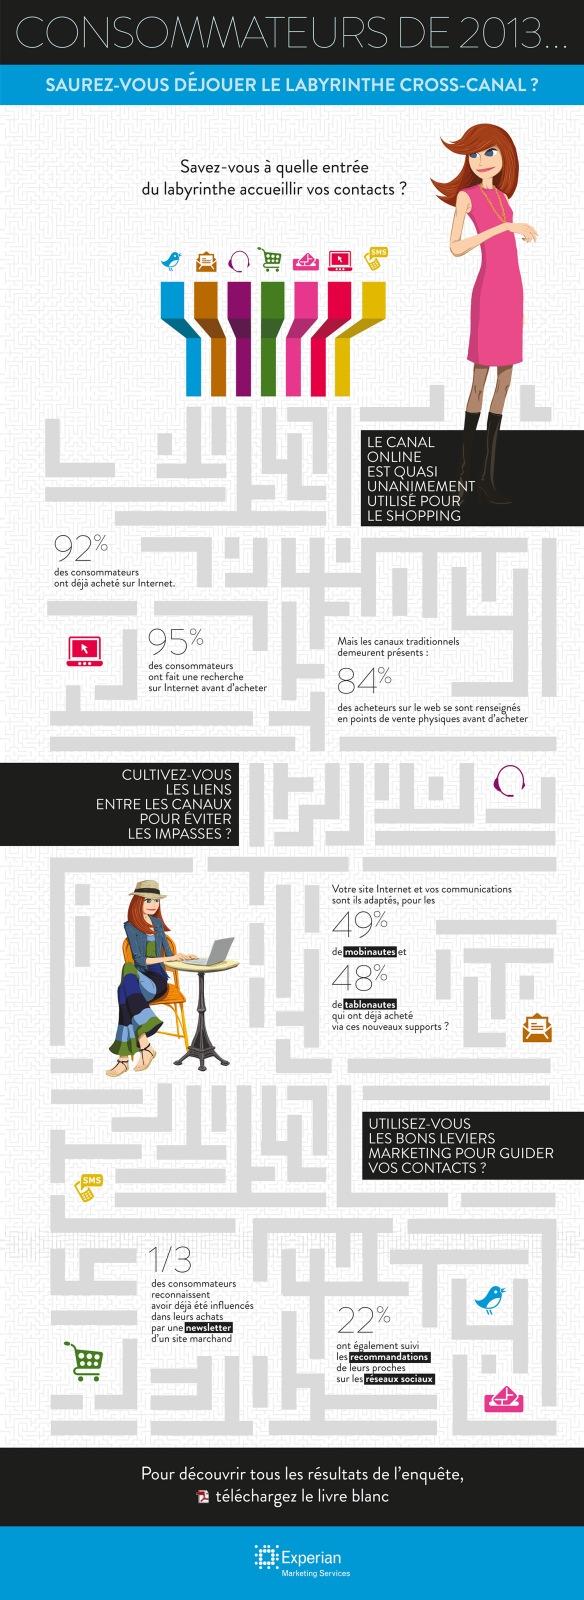 Infographie Stratégie Cross-Canal Consommateurs 2013